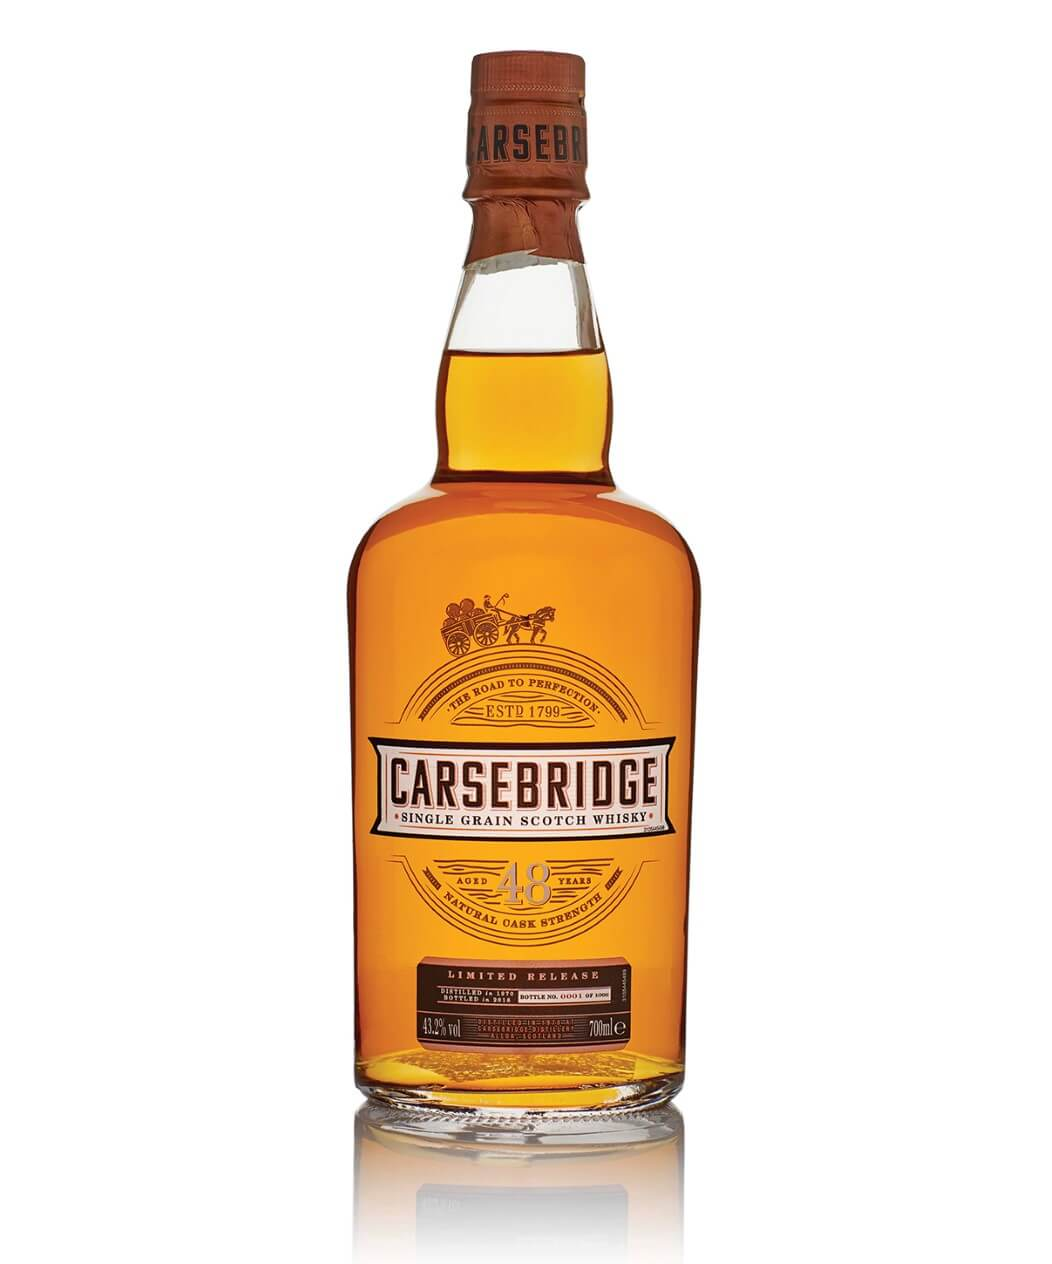 Carsebridge, Aged 48 Years